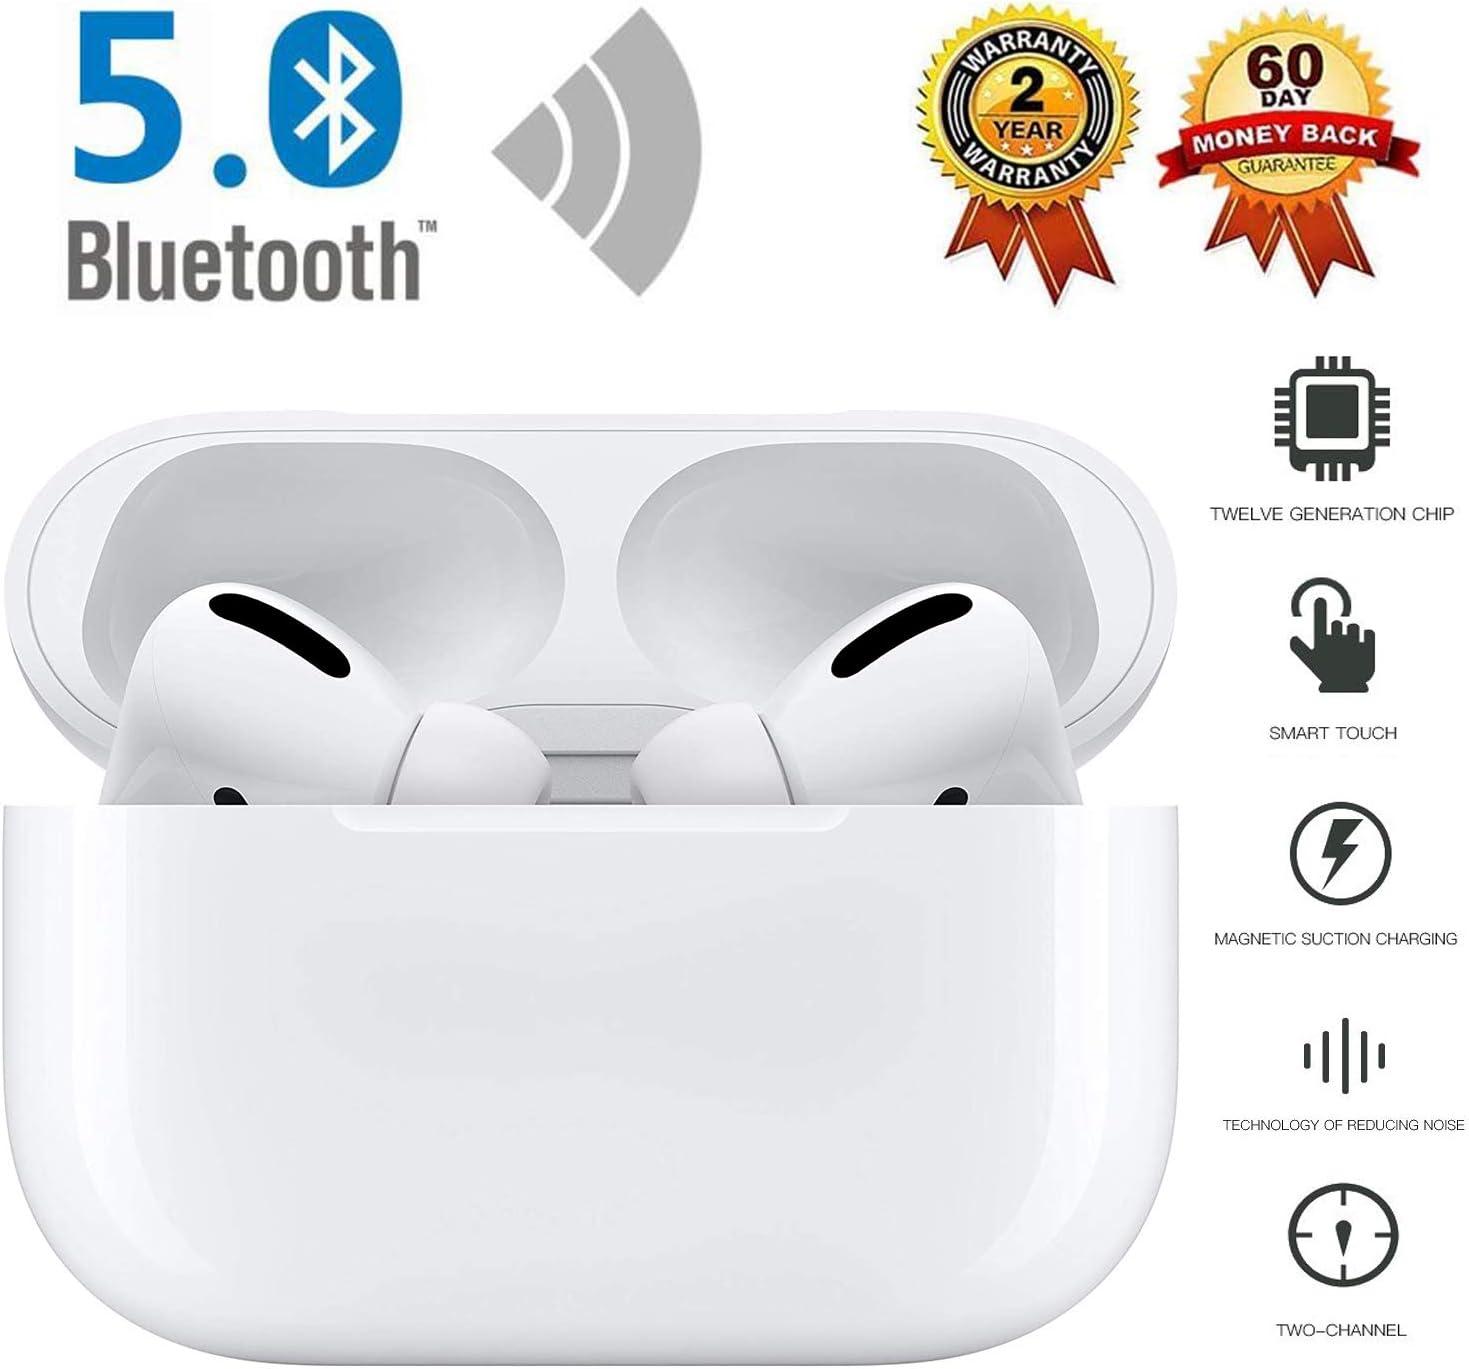 Auriculares Bluetooth 5.0, Auriculares inalámbricos internos, IPX7 a Prueba de Agua, Compatible con iPhone/Huawei/Samsung/Airpods Pro